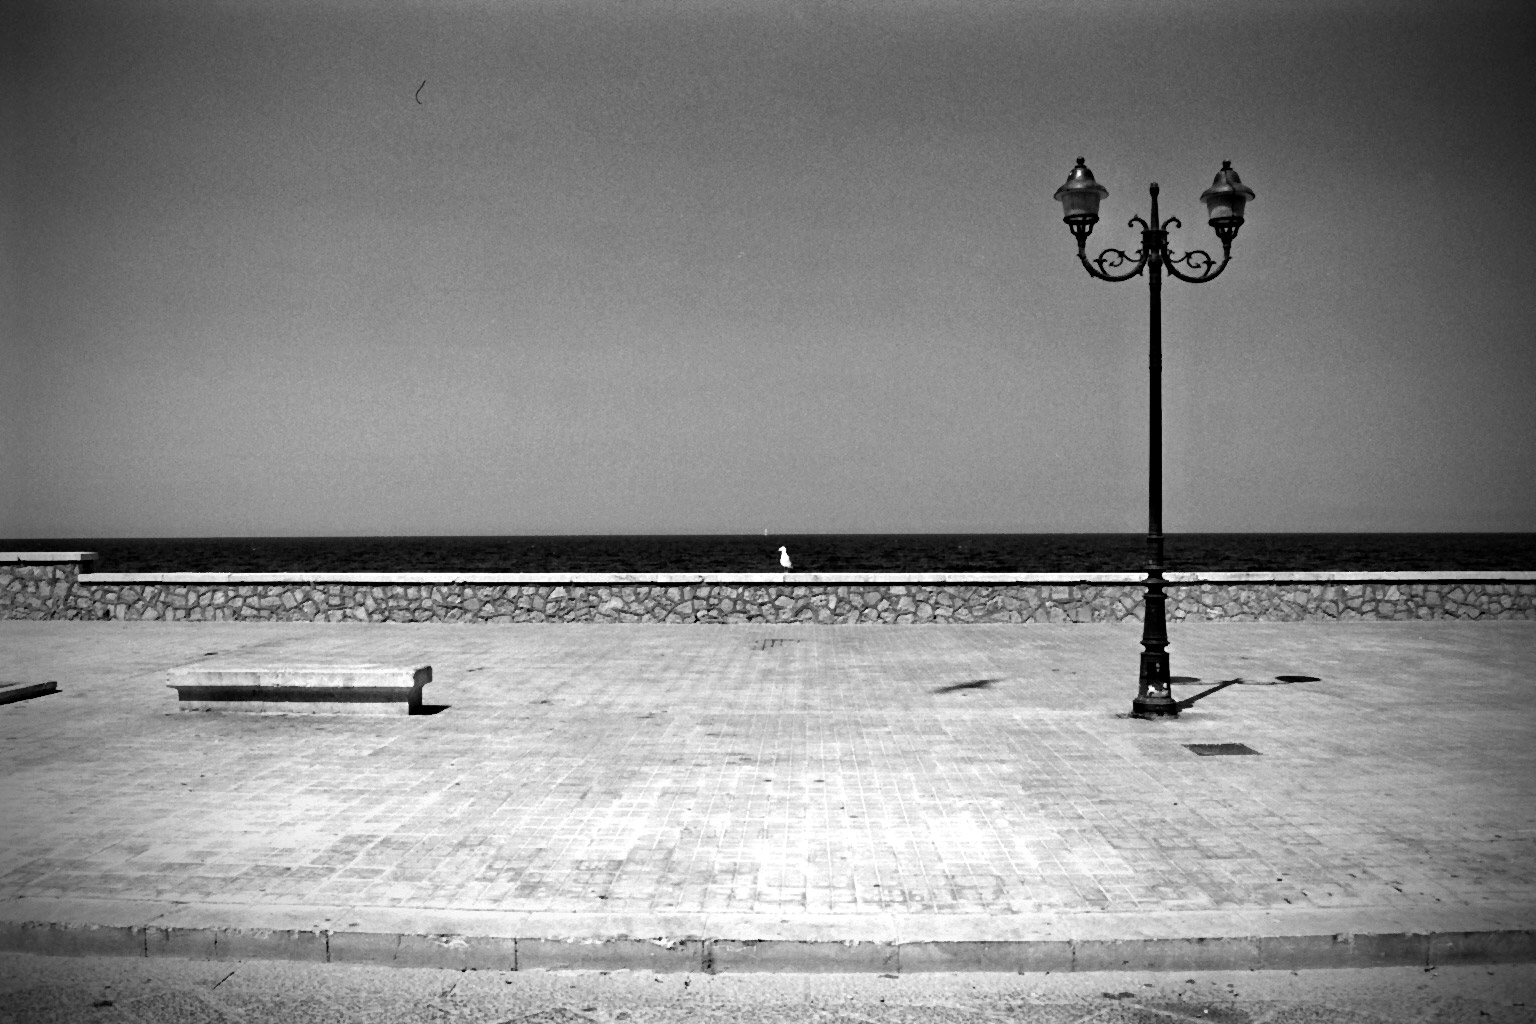 Trapani bw seaside view